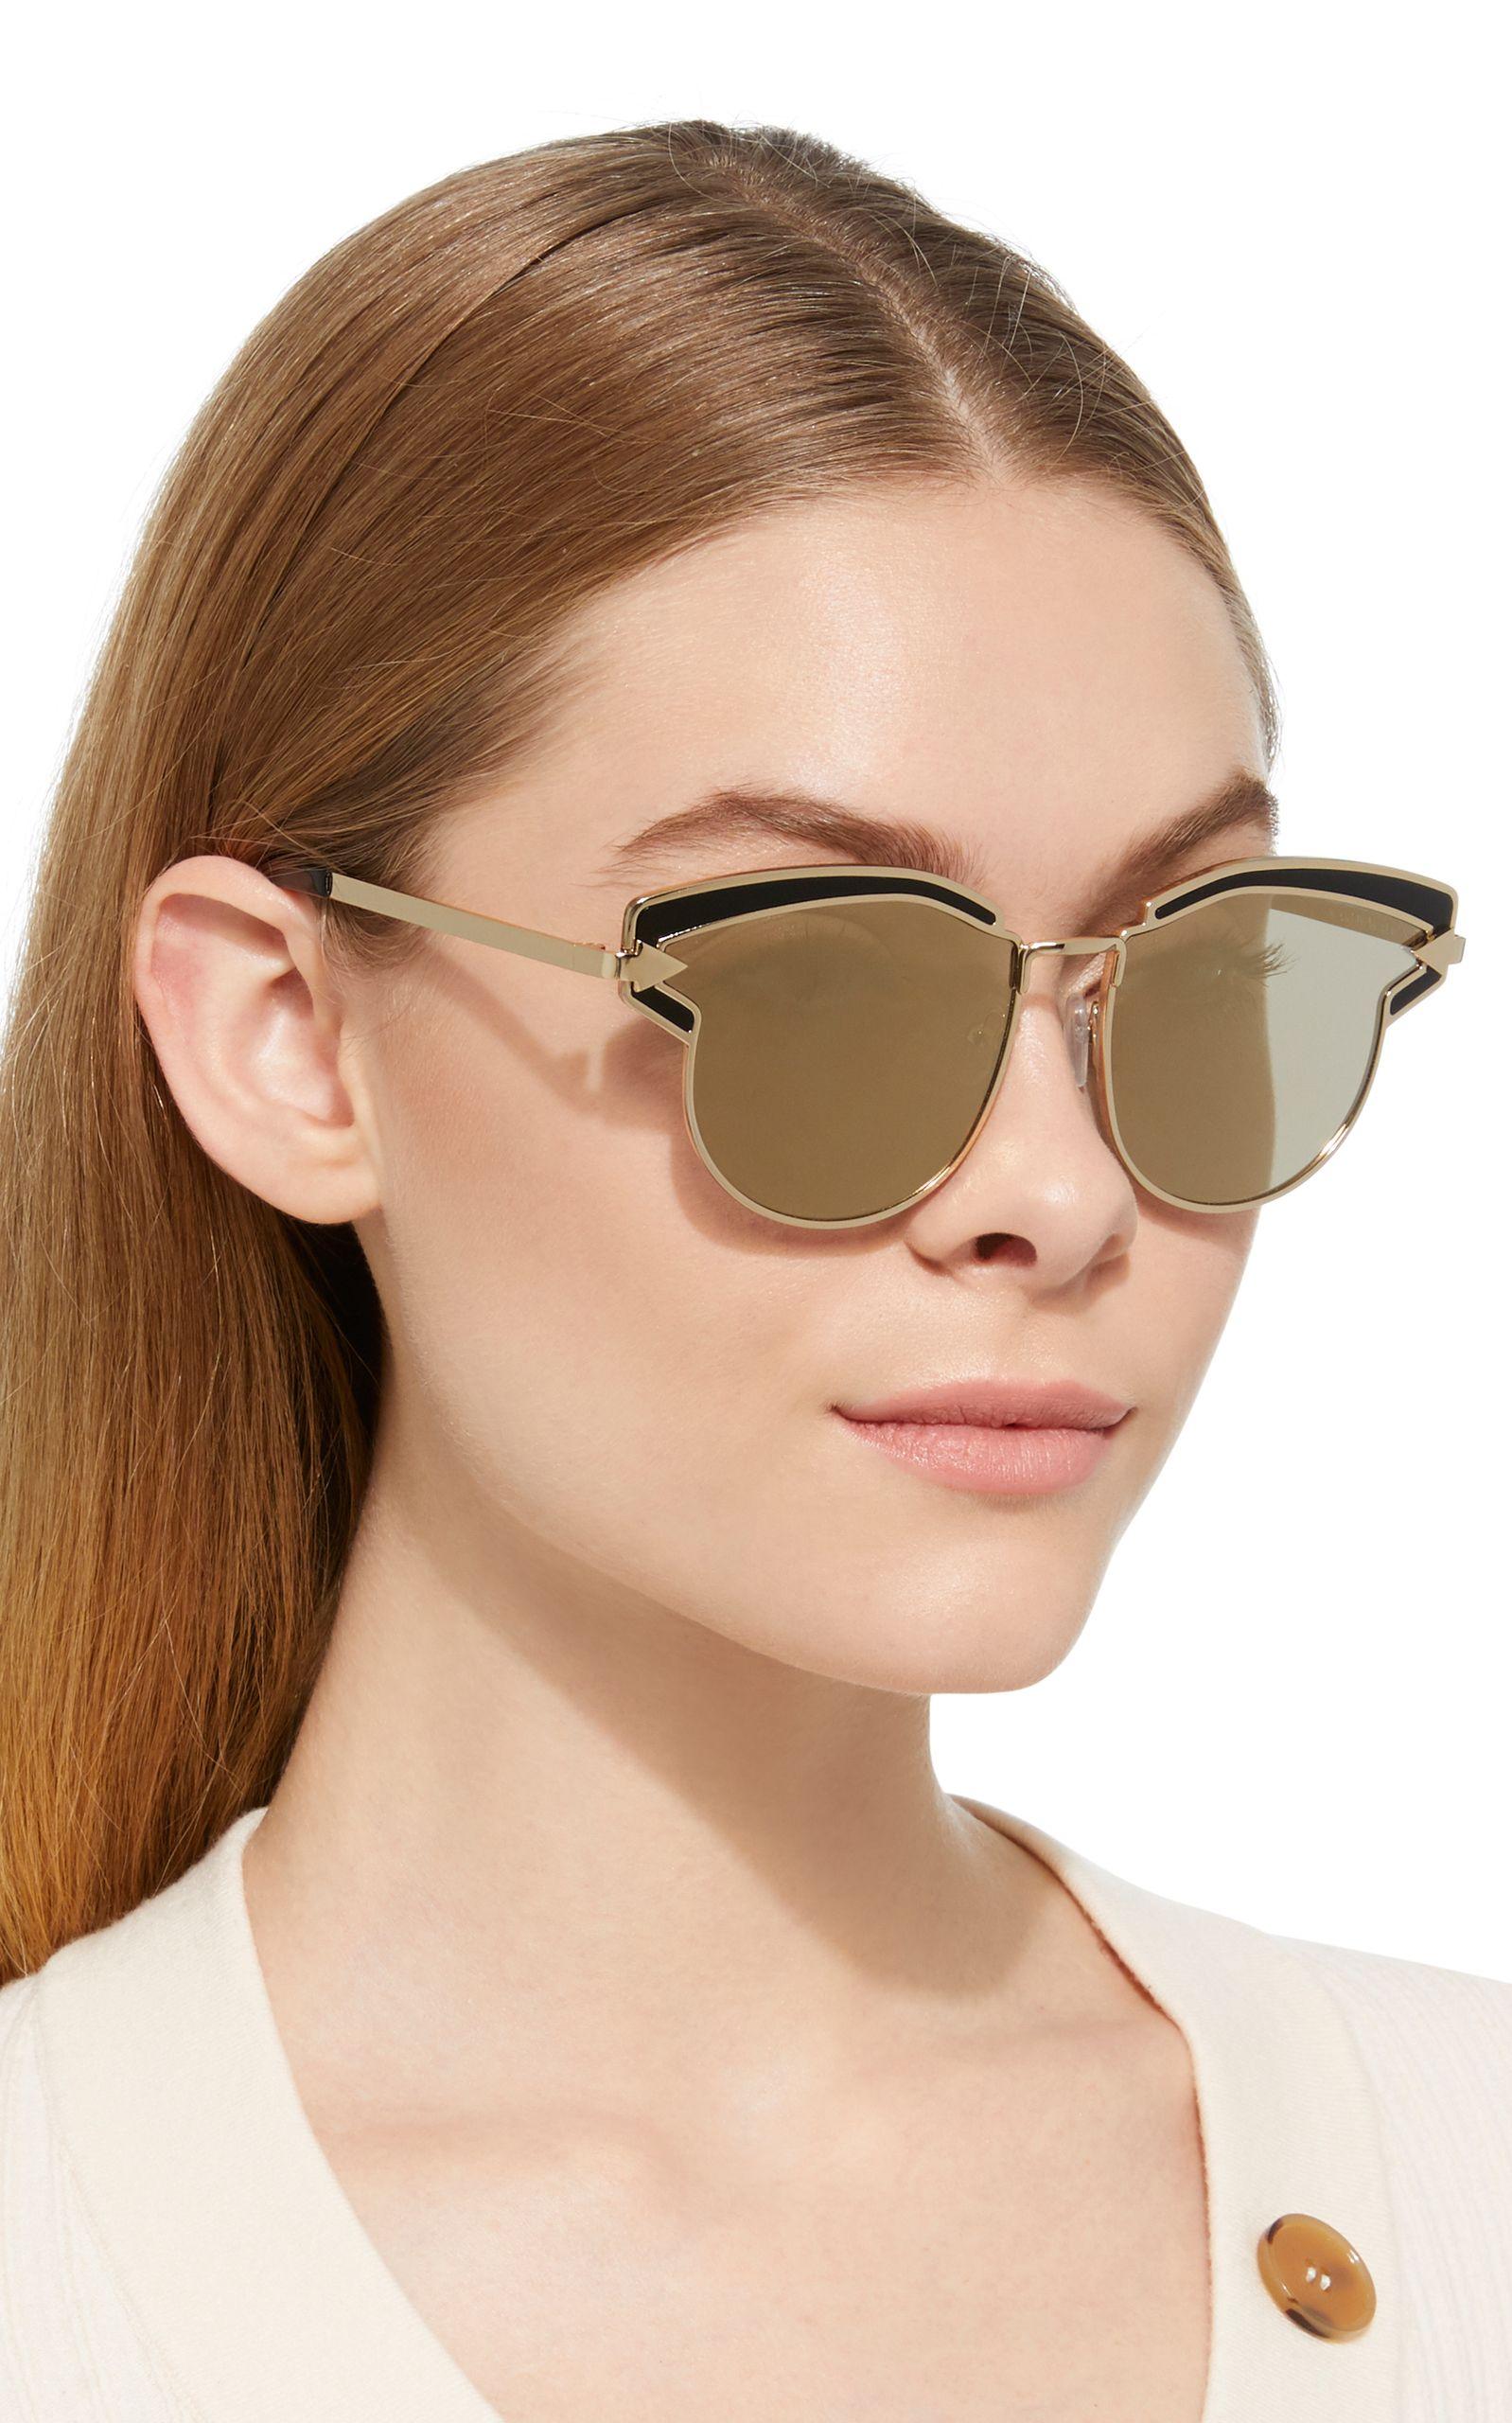 bd4ad6c1a95c Superstar Felipe Cat-Eye Acetate Sunglasses by KAREN WALKER Now Available  on Moda Operandi